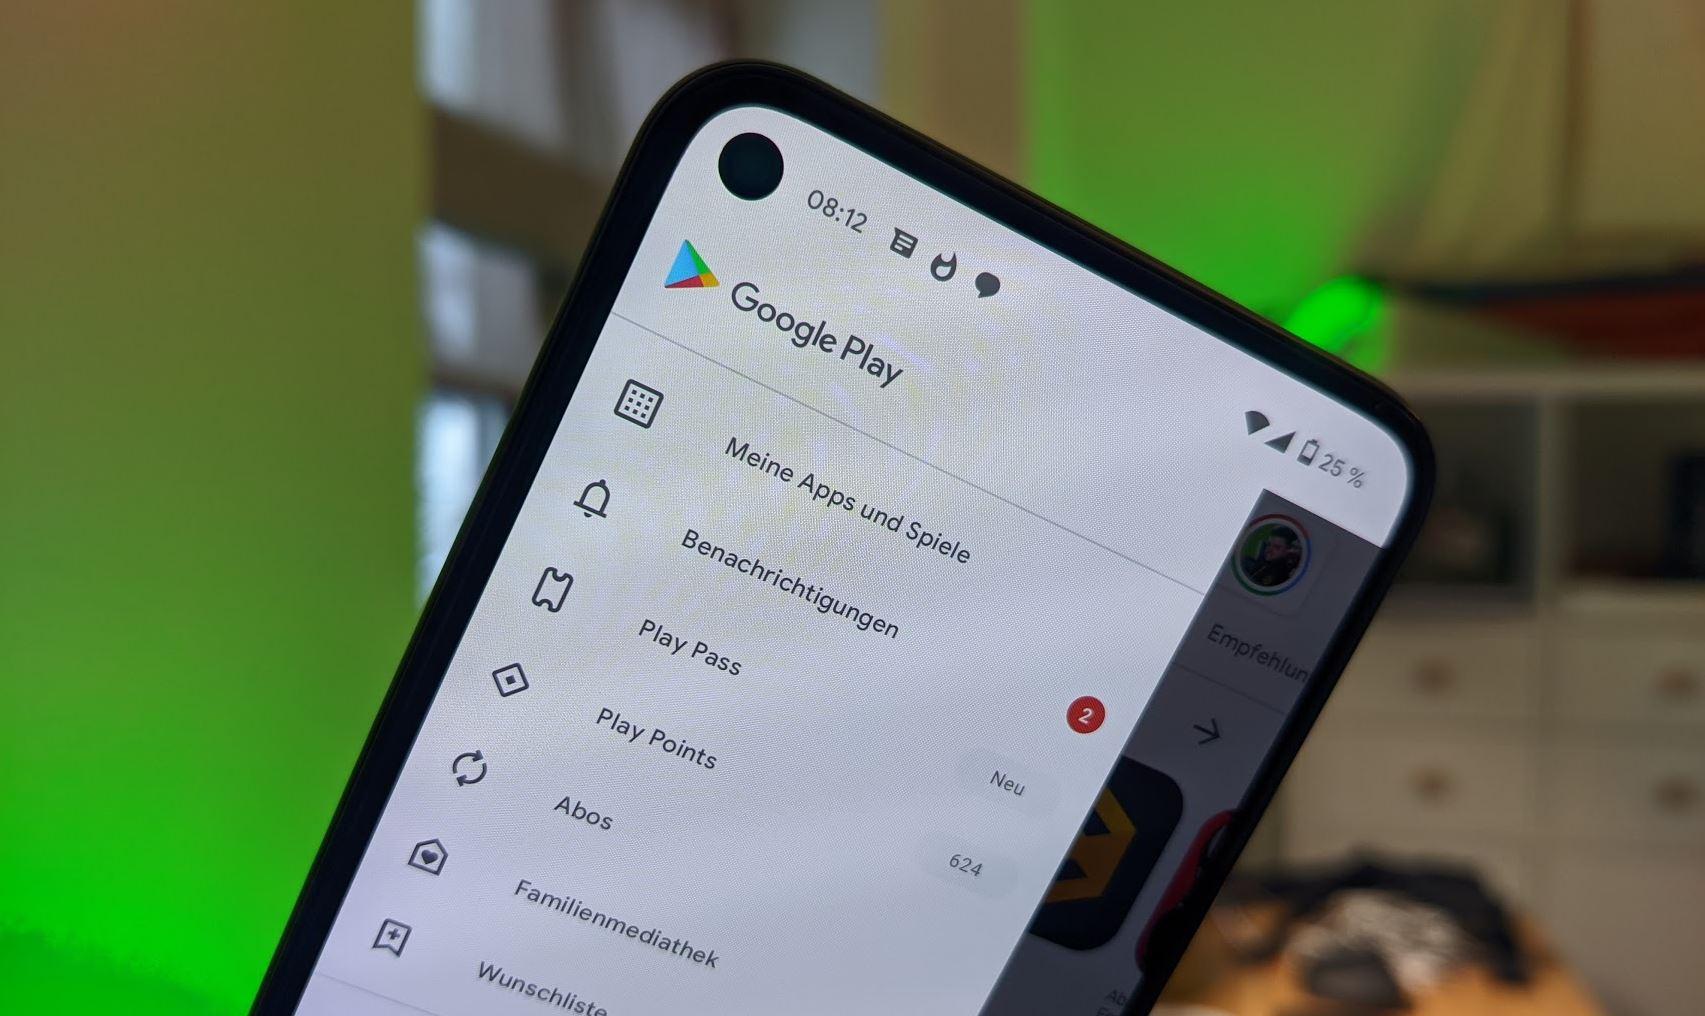 Fehler legen exklusive Play Points-Aktion für Google Pixel lahm